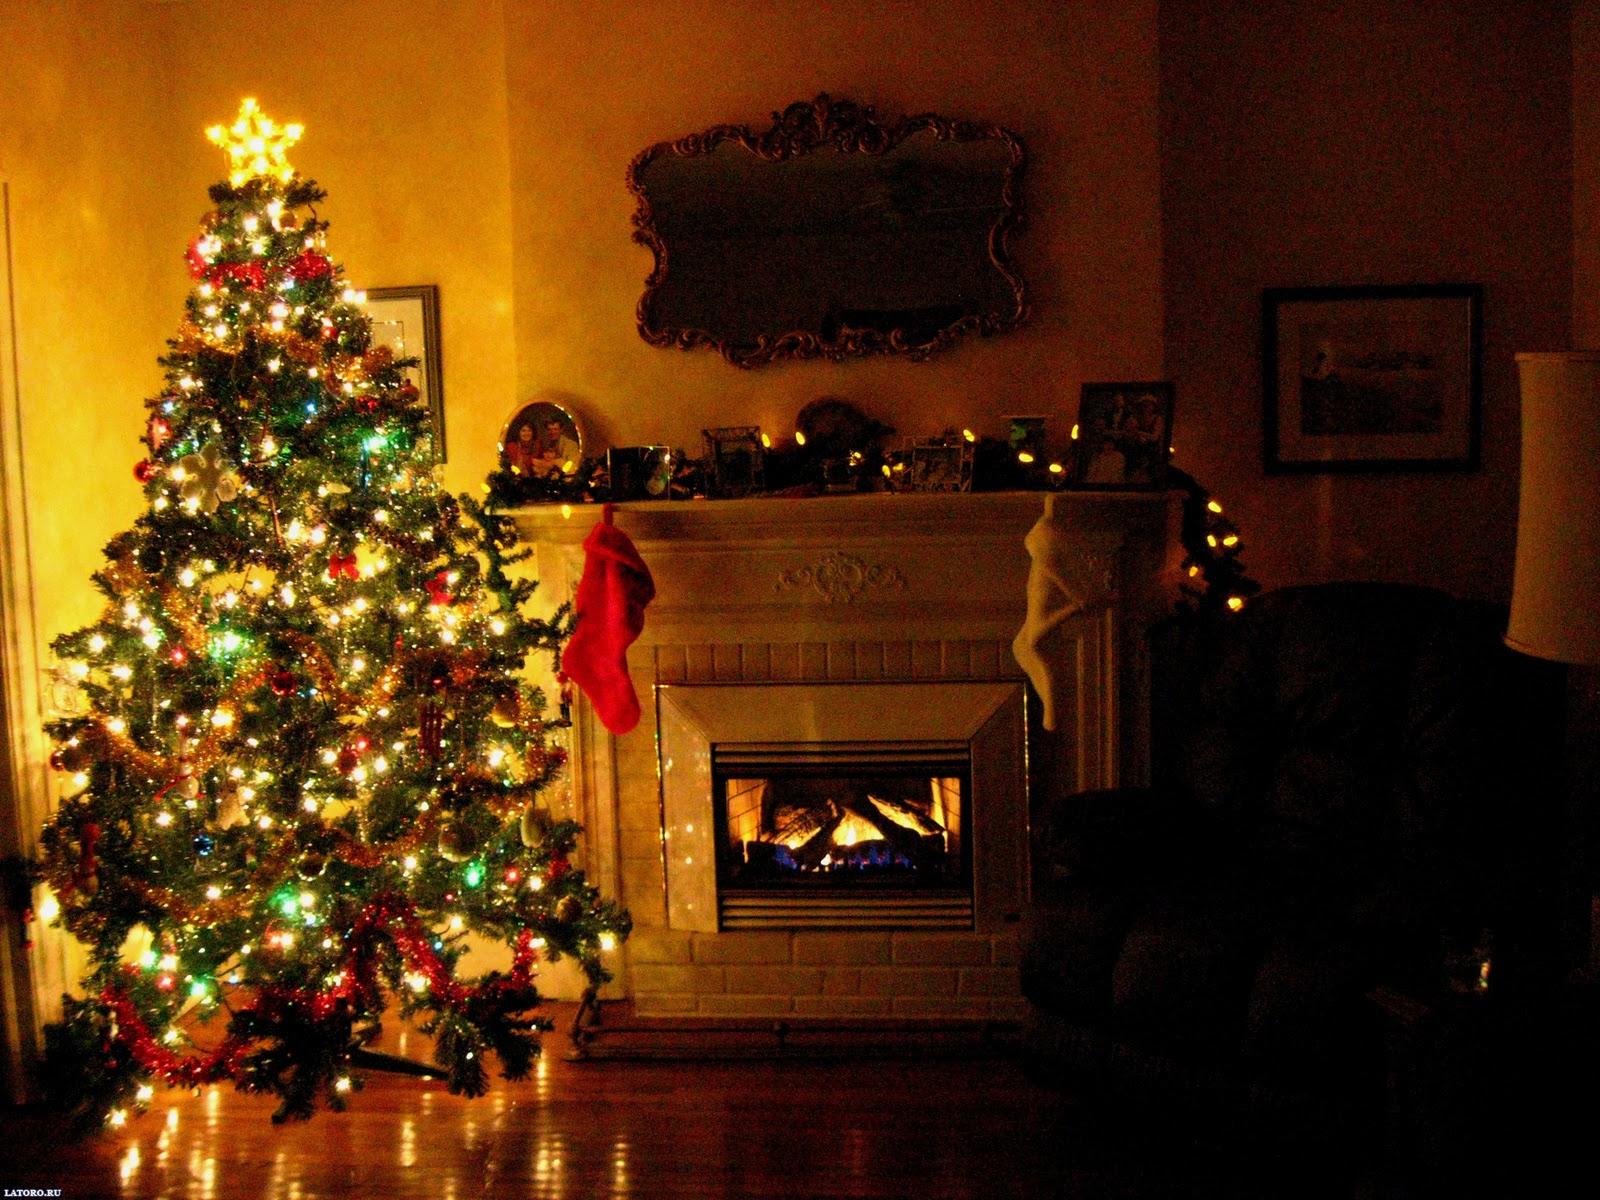 http://1.bp.blogspot.com/-PTG4jzv93ak/TrQY53n7oII/AAAAAAAABS8/KdVAlN-3DEg/s1600/desktop-wallpapers-christmas-tree.jpg